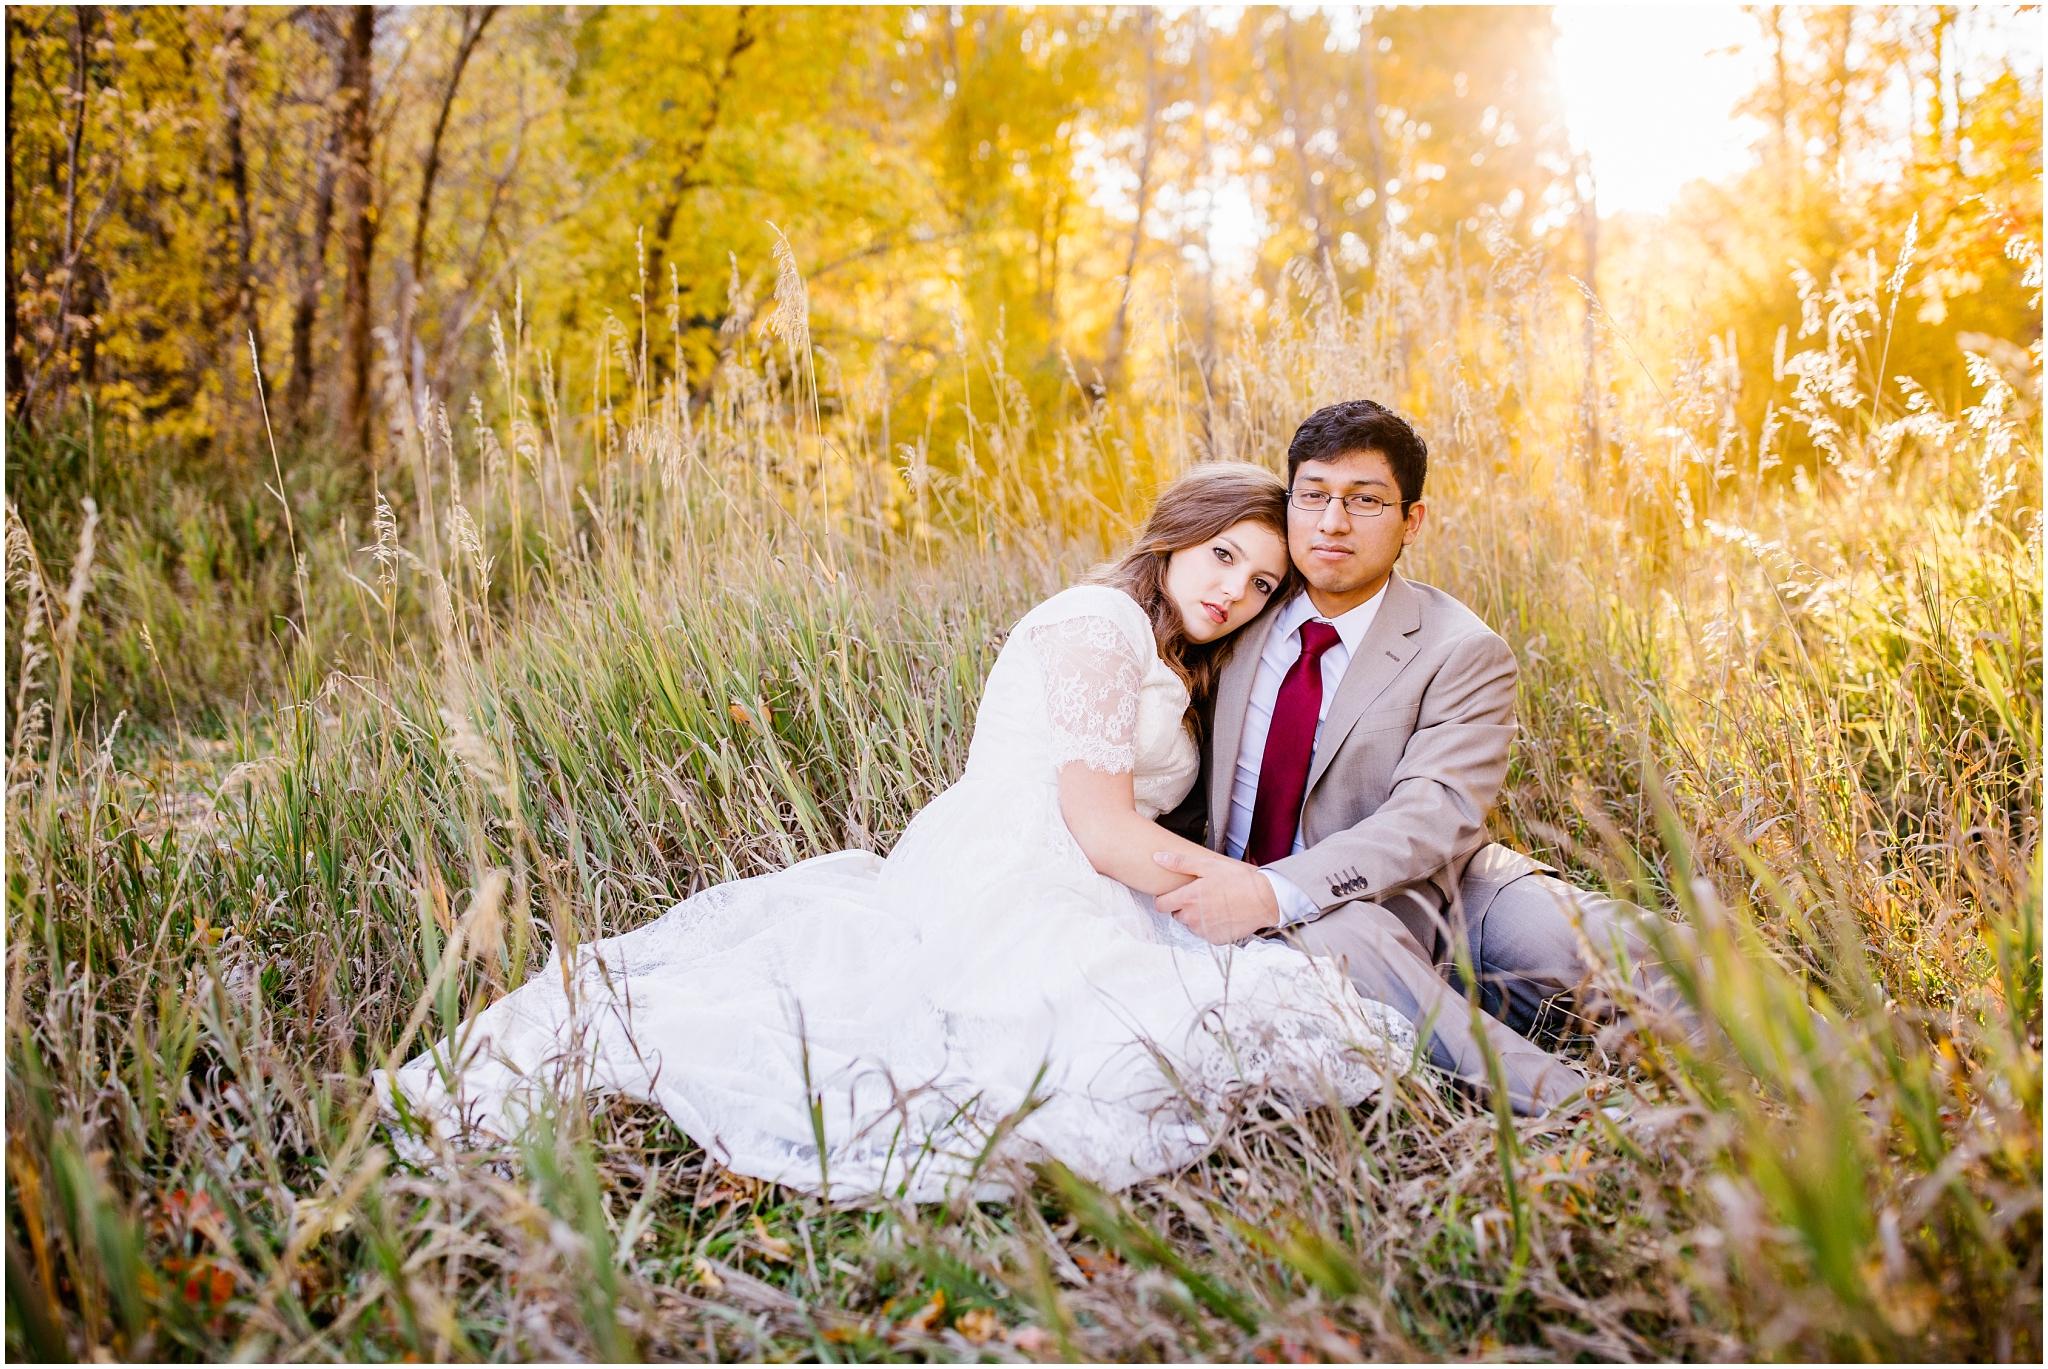 HE-BRIDALS-9_Lizzie-B-Imagery-Utah-Wedding-Photographer-Central-Utah-Park-City-Salt-Lake-City-Hobble-Creek-Canyon-Springville.jpg